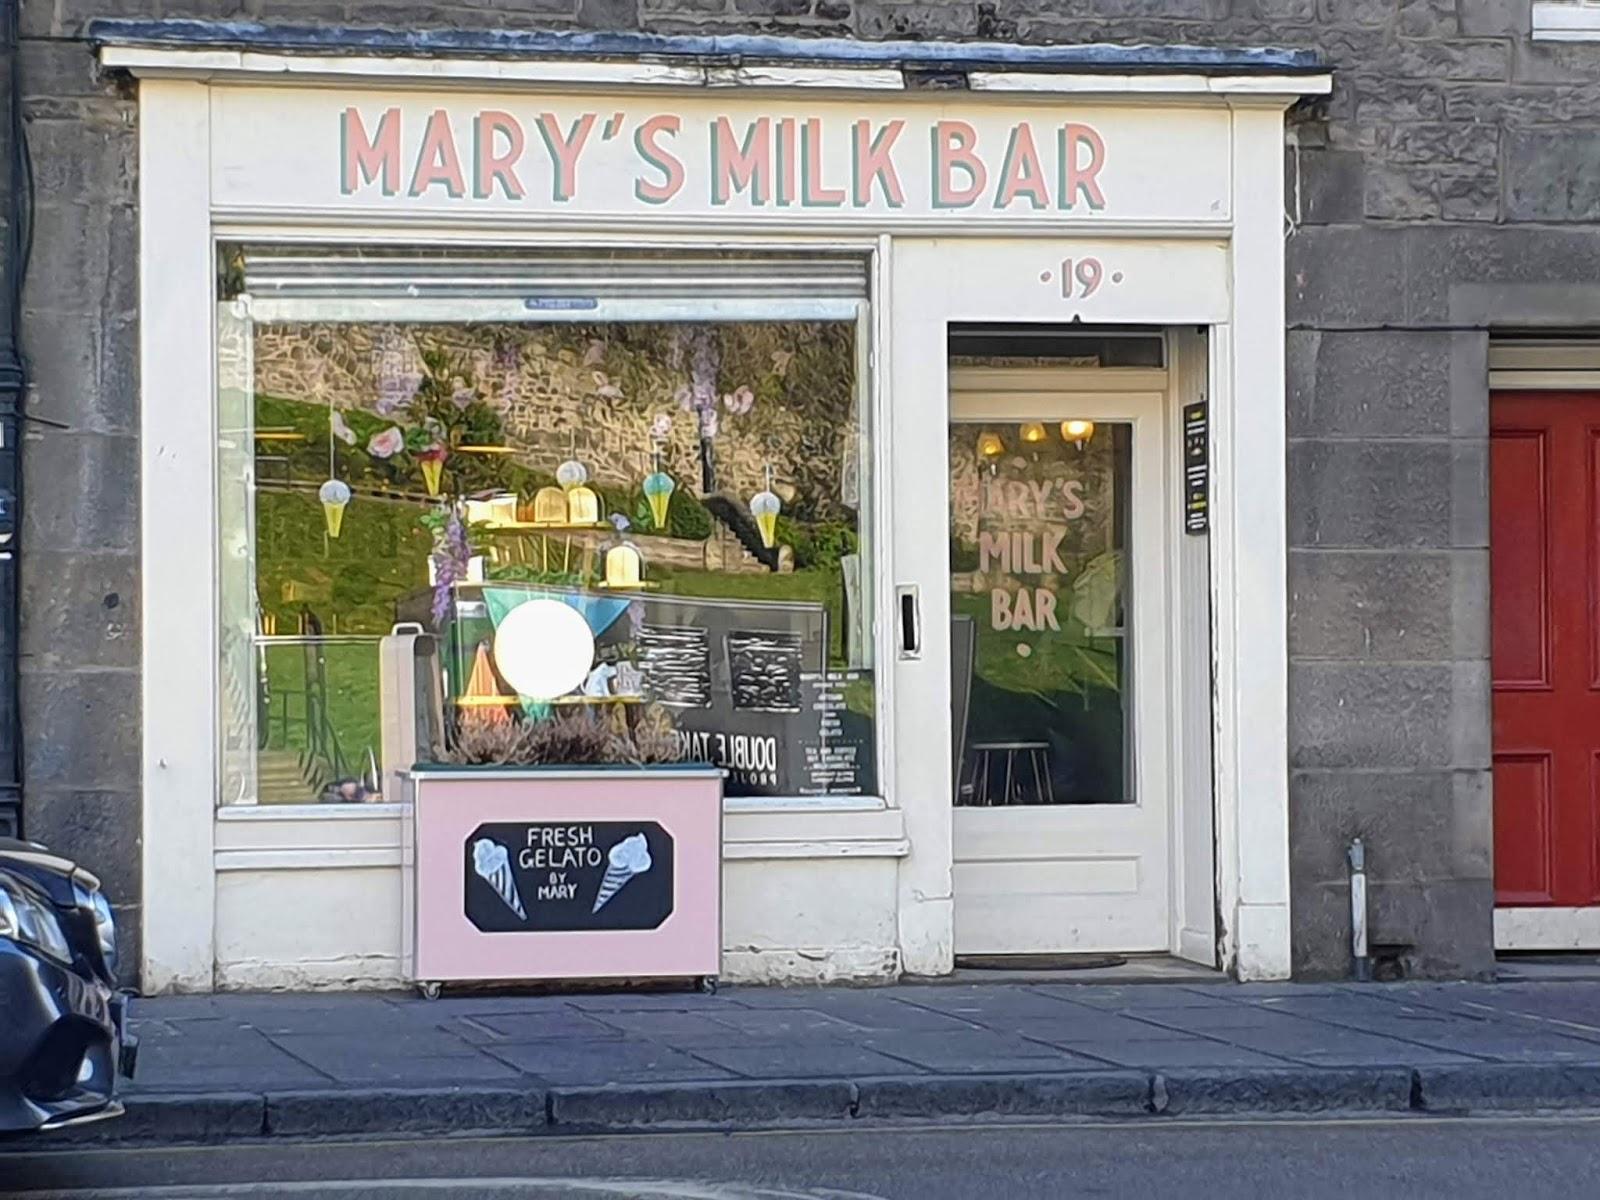 mary's milk bar edinburgh